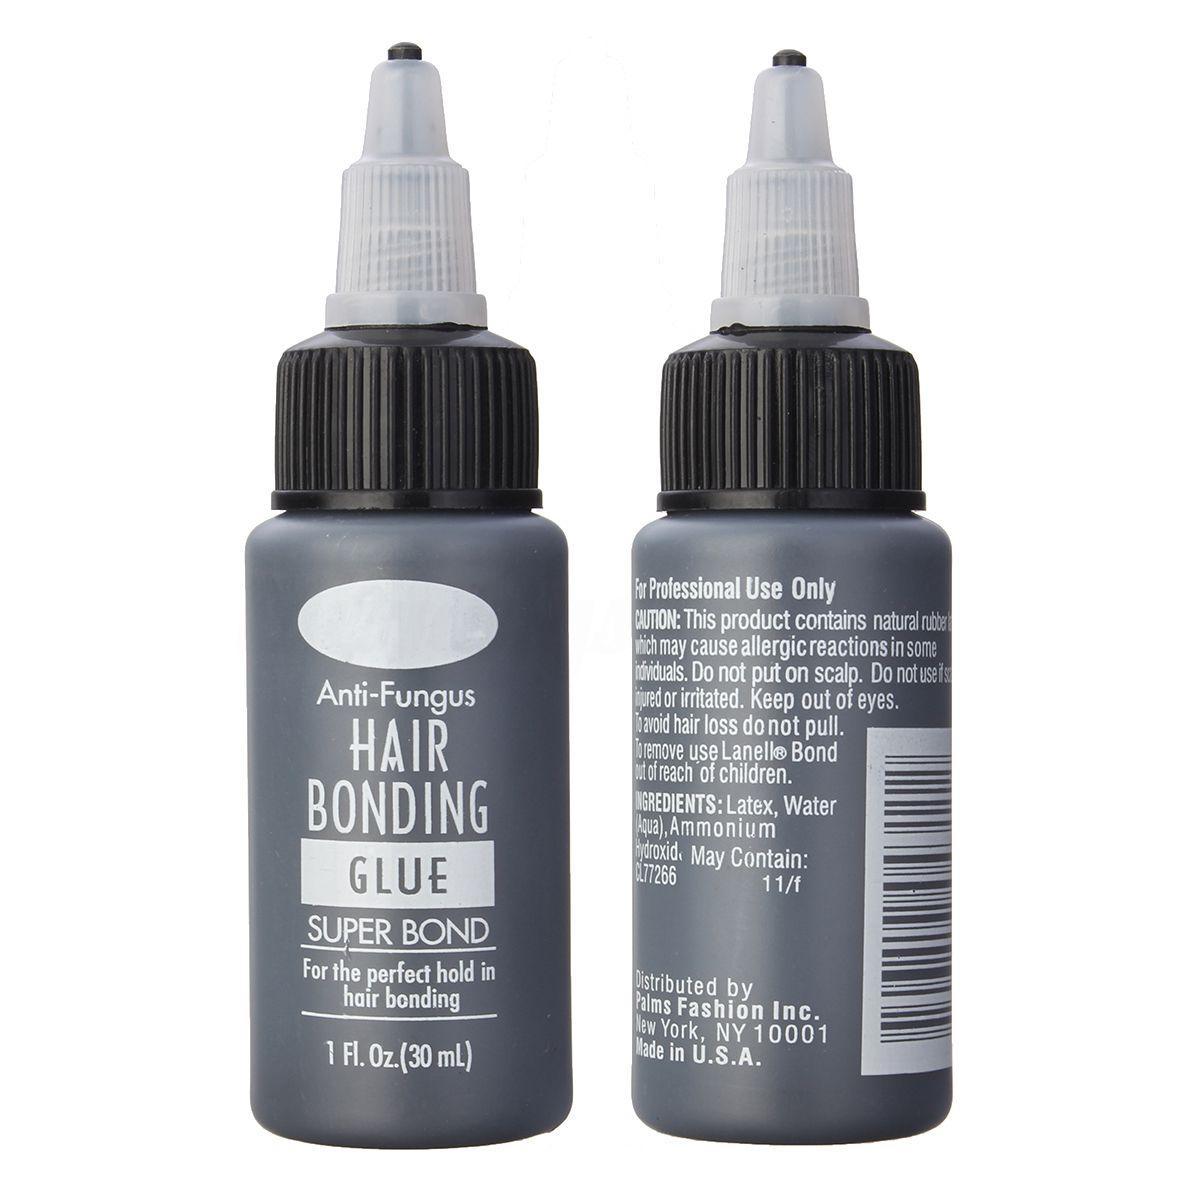 RITZKART ANTI FUNGUS SUPER HAIR BONDING/REMOVING GLUE Carbomer, Fragerance,Latex, Water, Ammonium